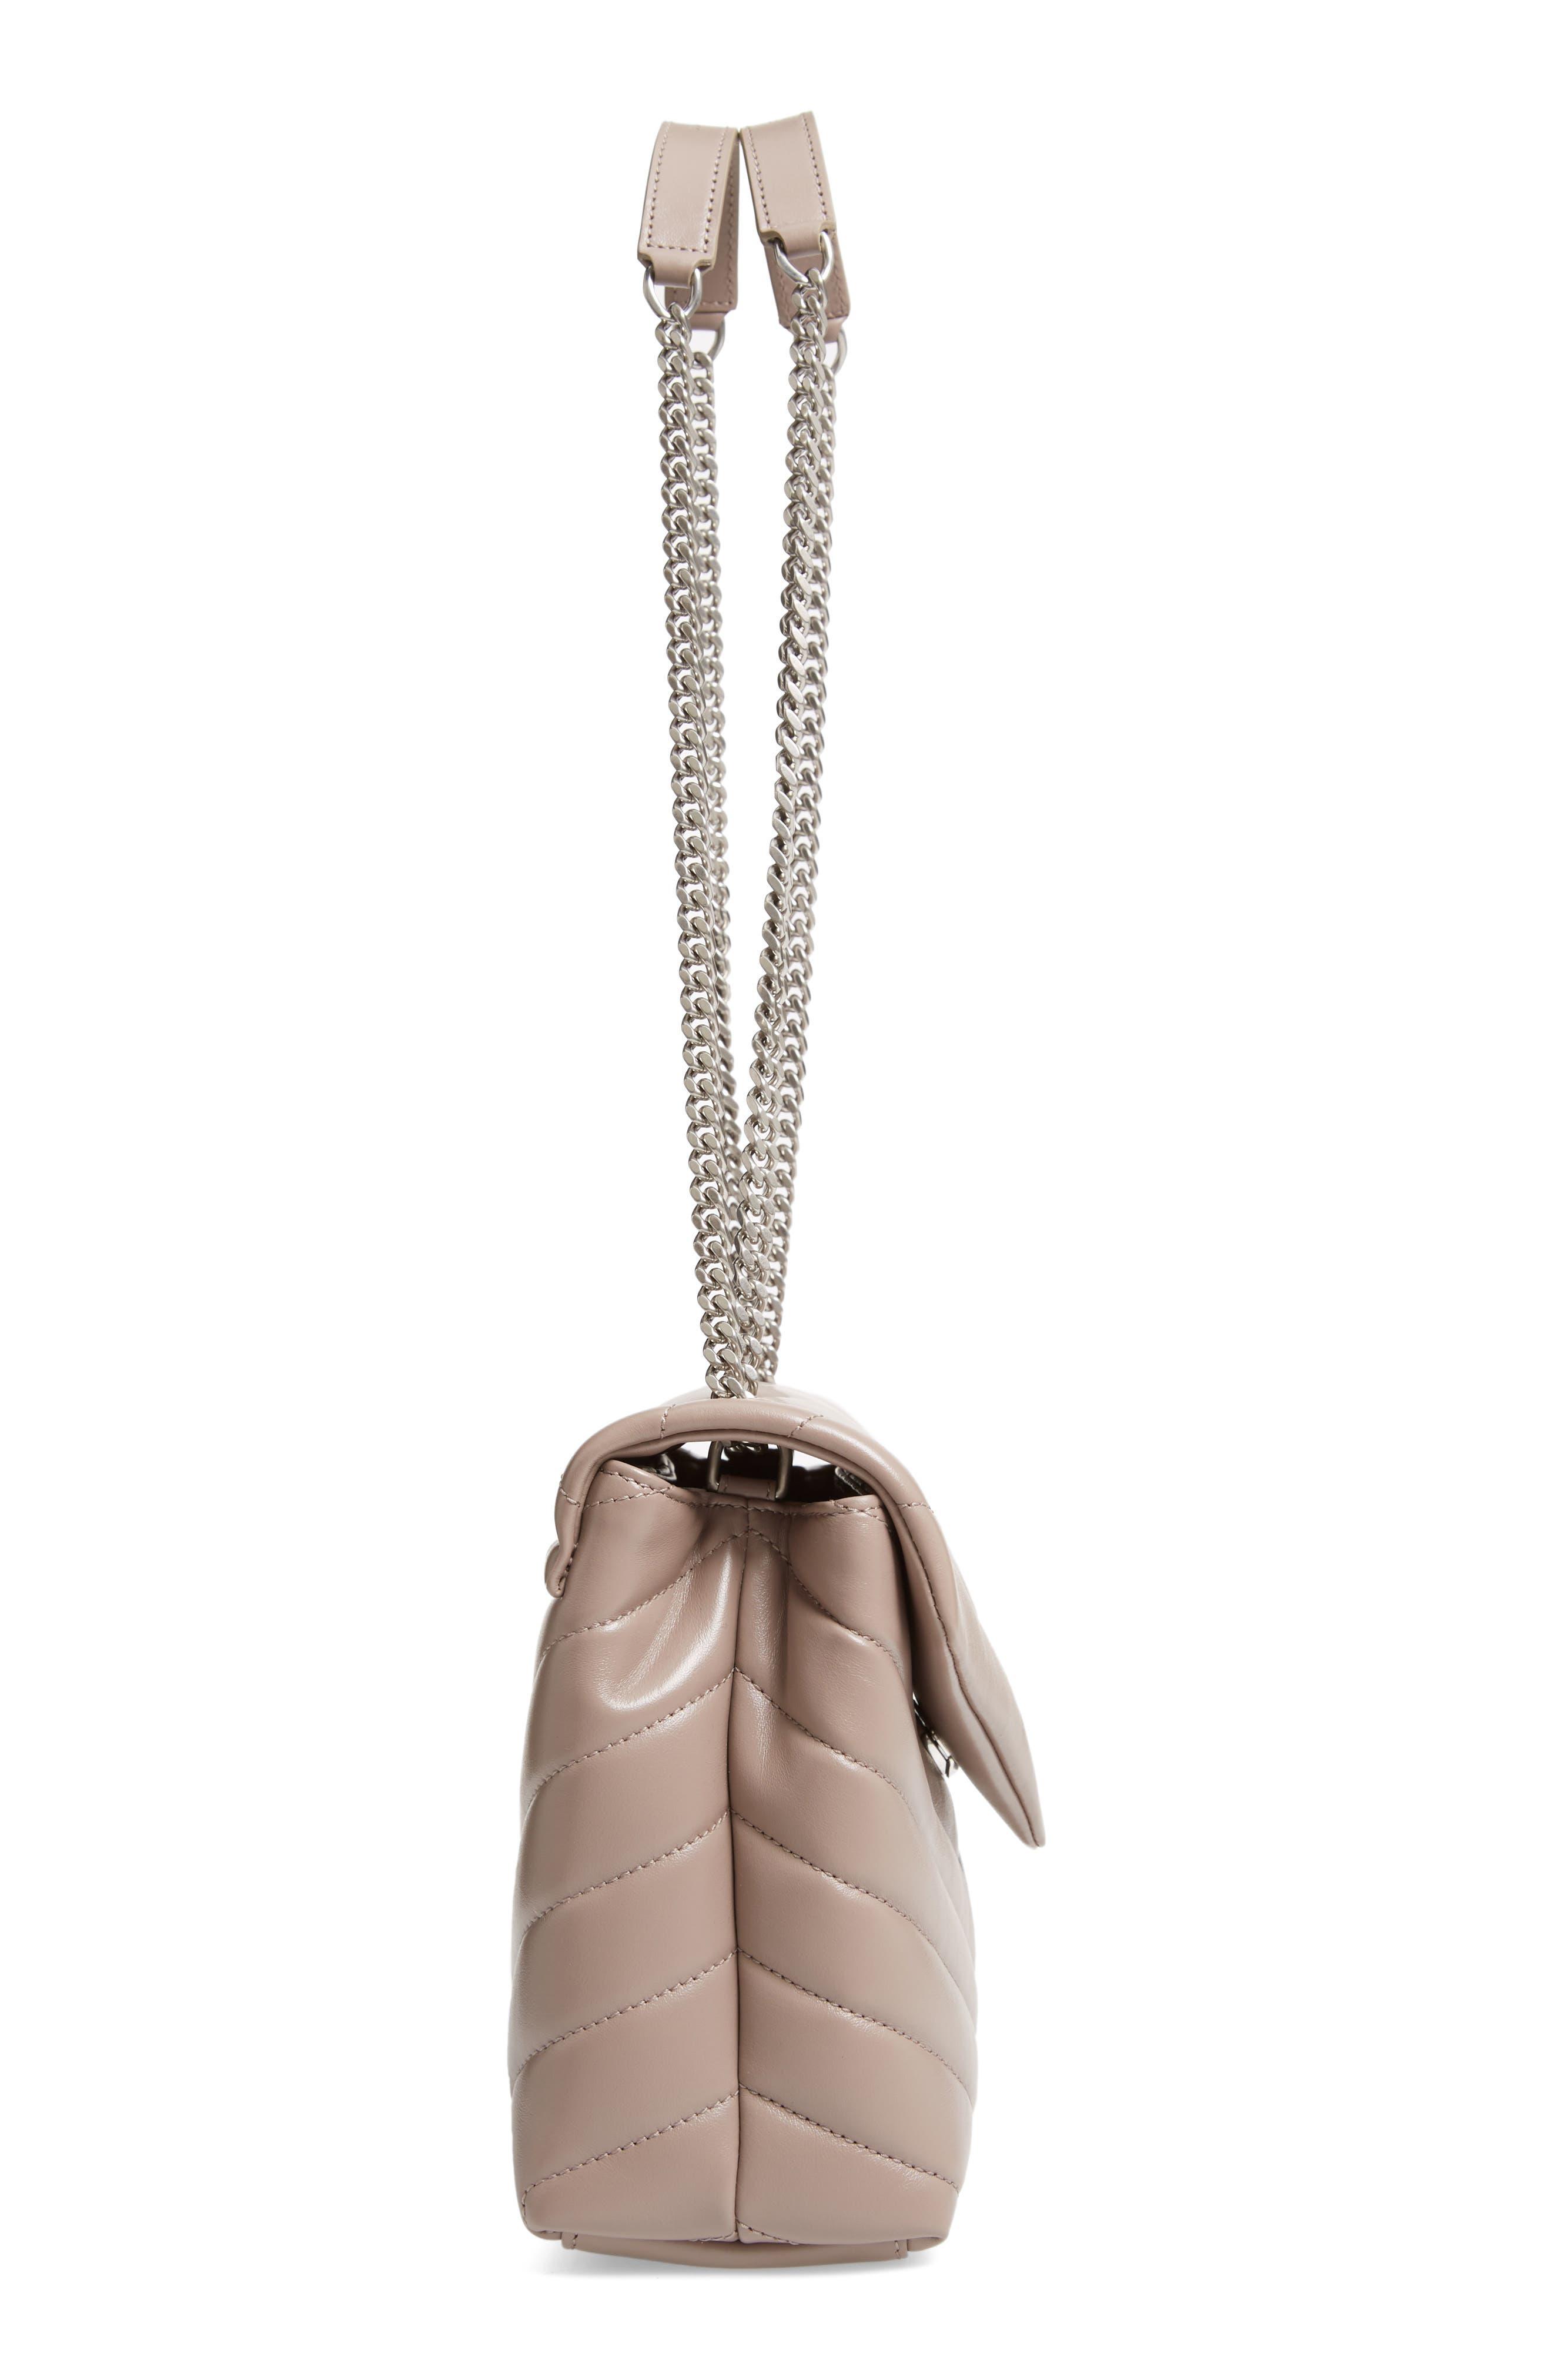 Small Loulou Matelassé Leather Shoulder Bag,                             Alternate thumbnail 5, color,                             TAUPE SABLE